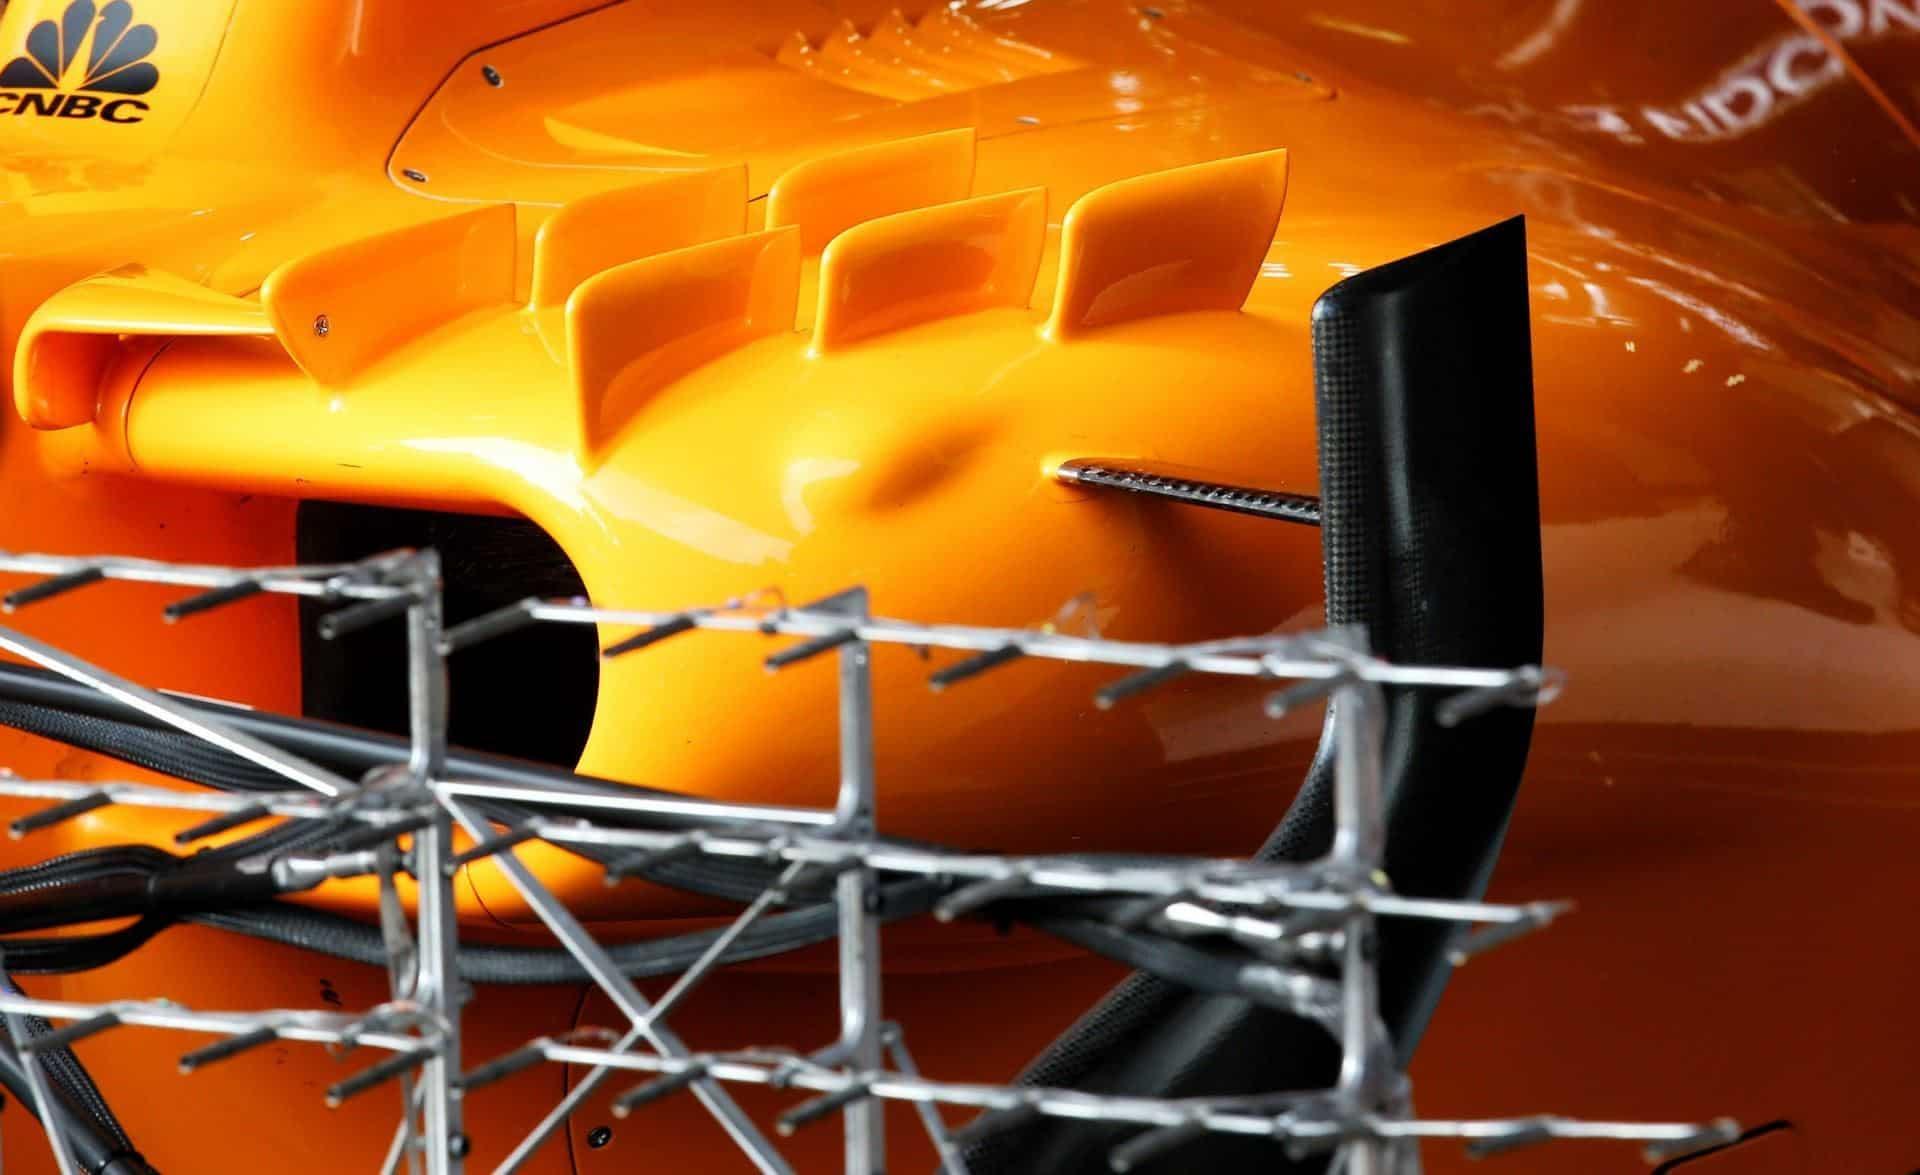 Vandoorne McLaren MCL33 Barcelona F1 2018 testing sidepod close